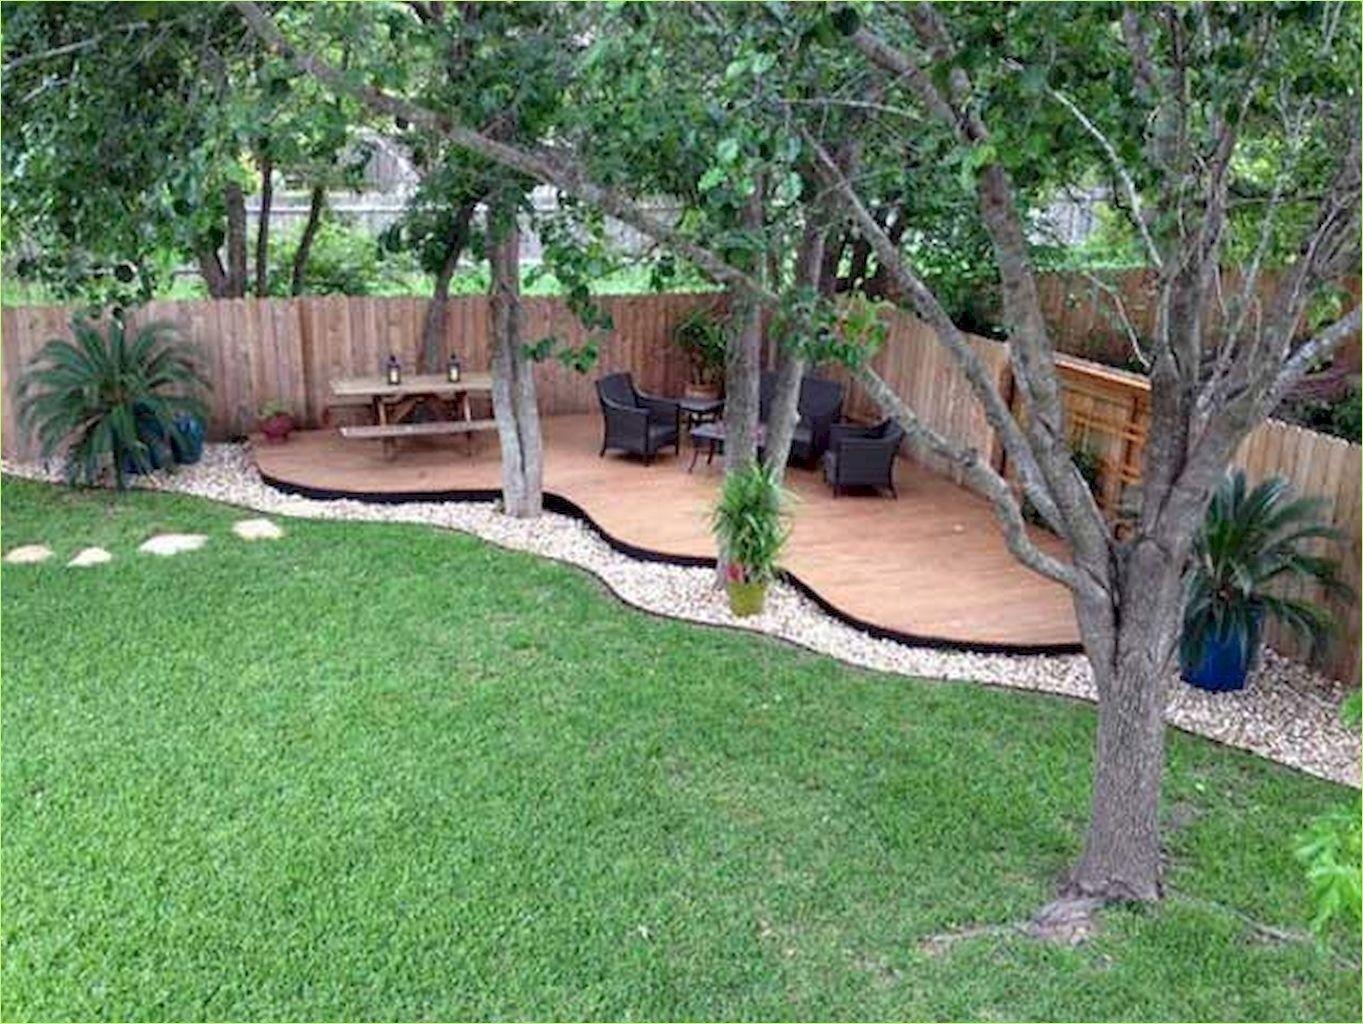 49 Beautiful Small Backyard with Lawn Ideas   Back yard ideas ...